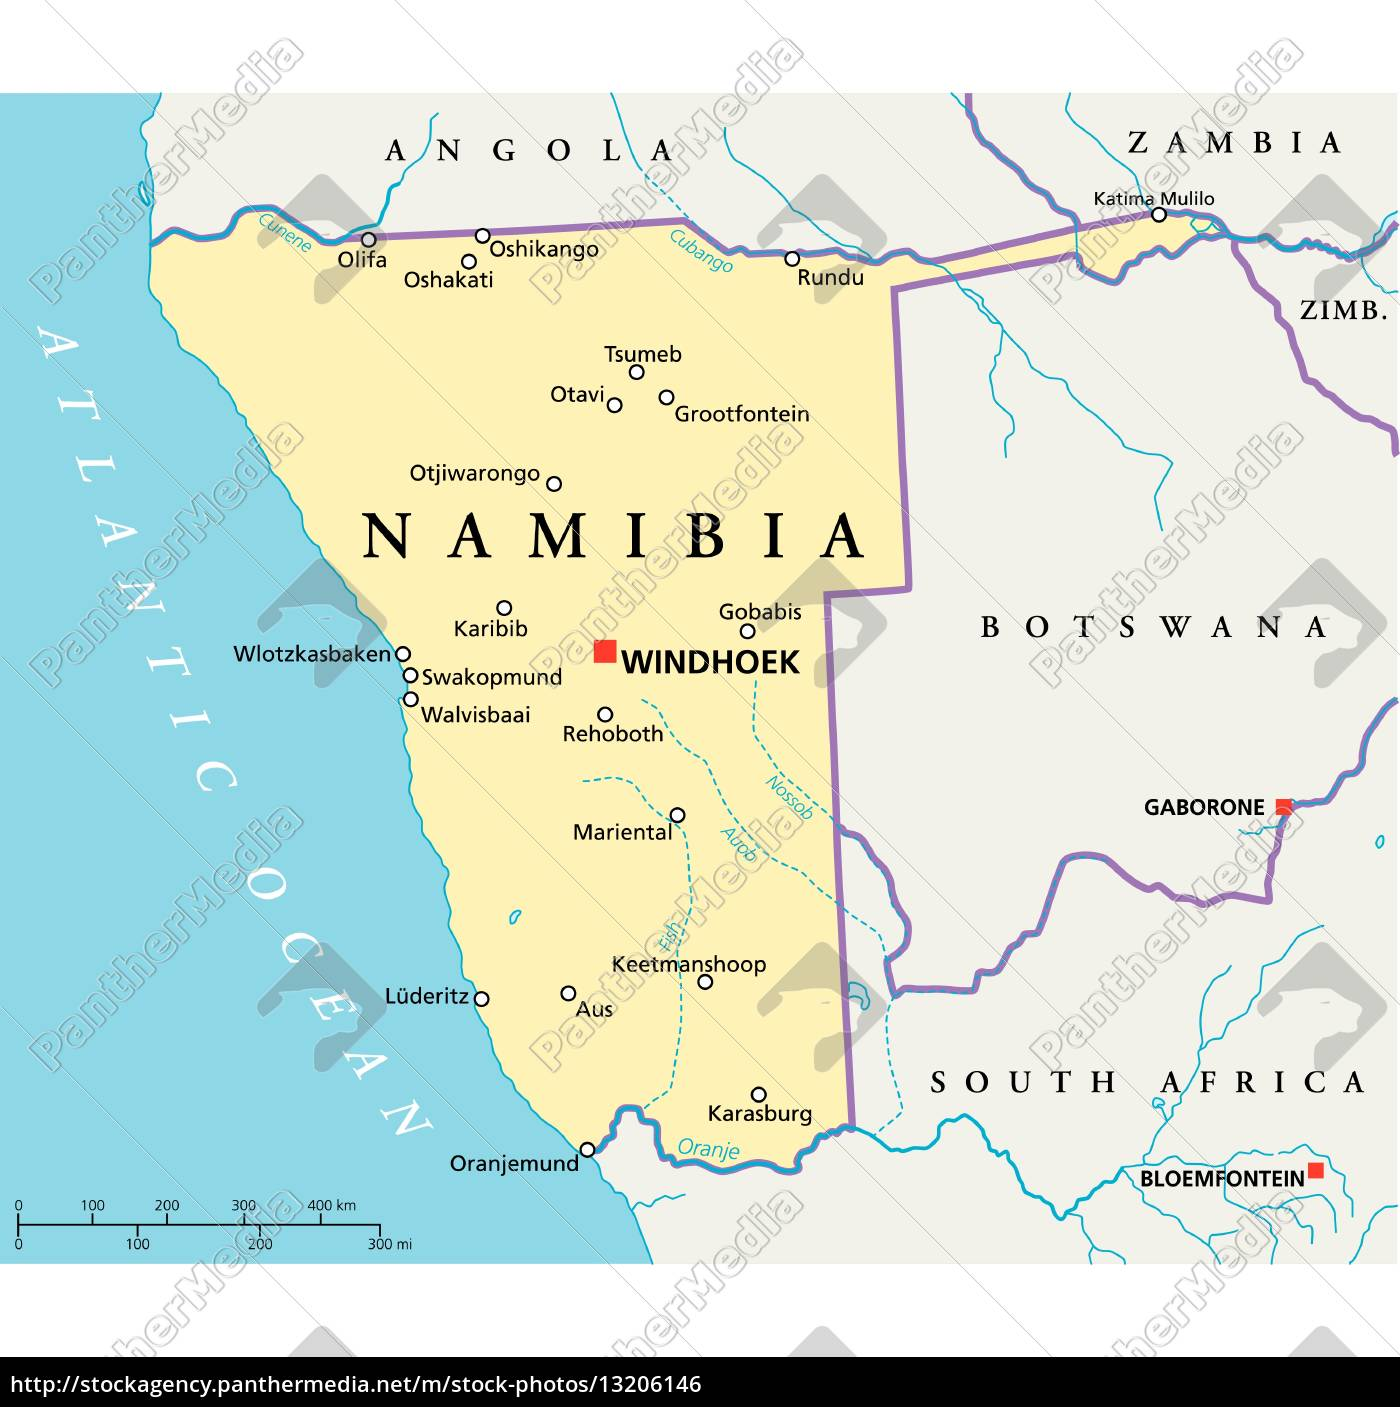 karte namibia namibia politische karte   Stock Photo   #13206146   Bildagentur